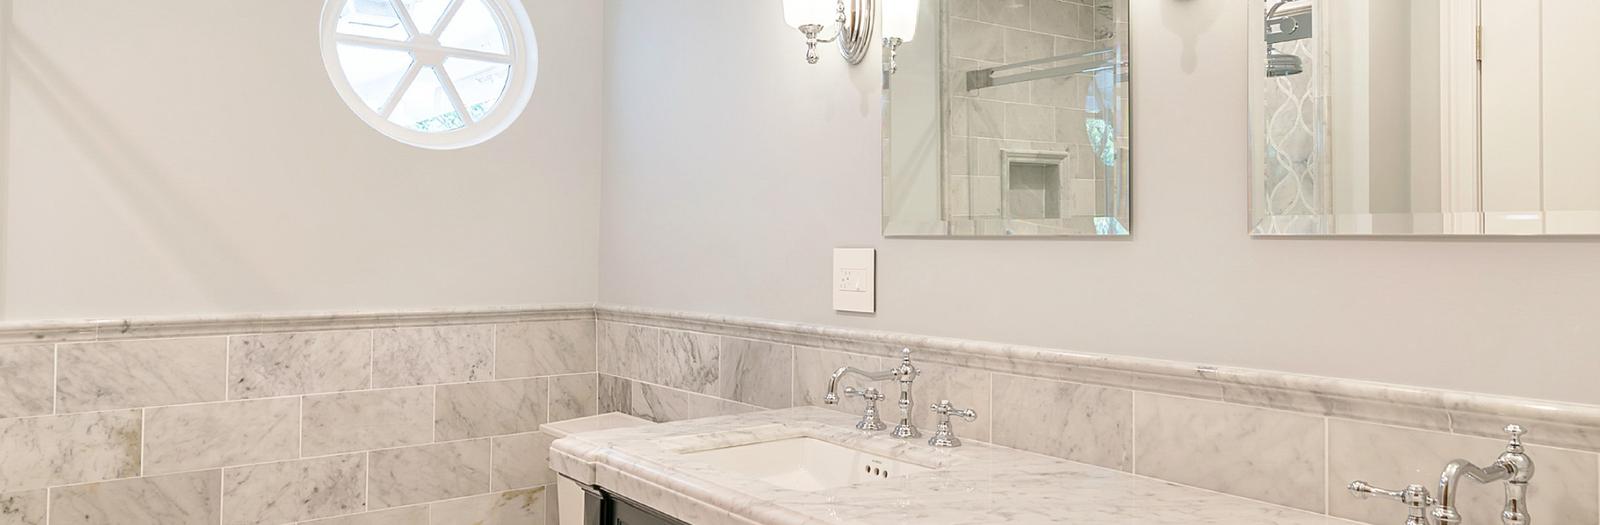 Ideas for home design decorating and remodeling designmine for Alpha home interior decoration llc